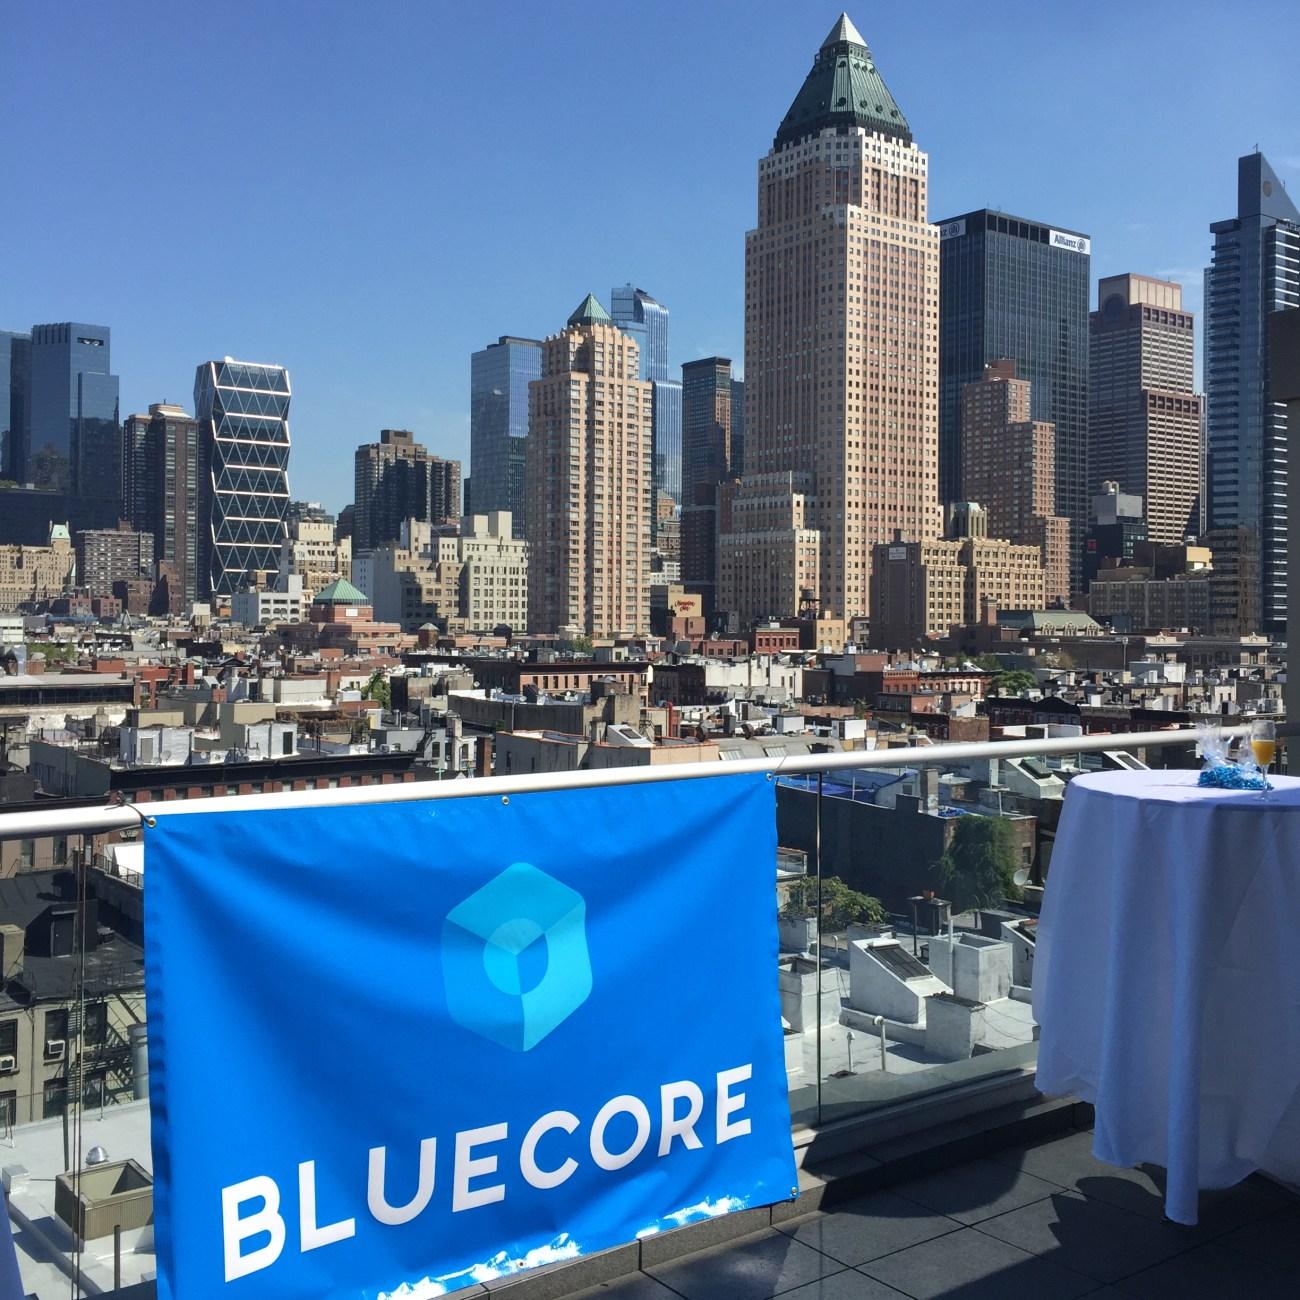 Ecommerce technology Startup Bluecore Closes $35 Million